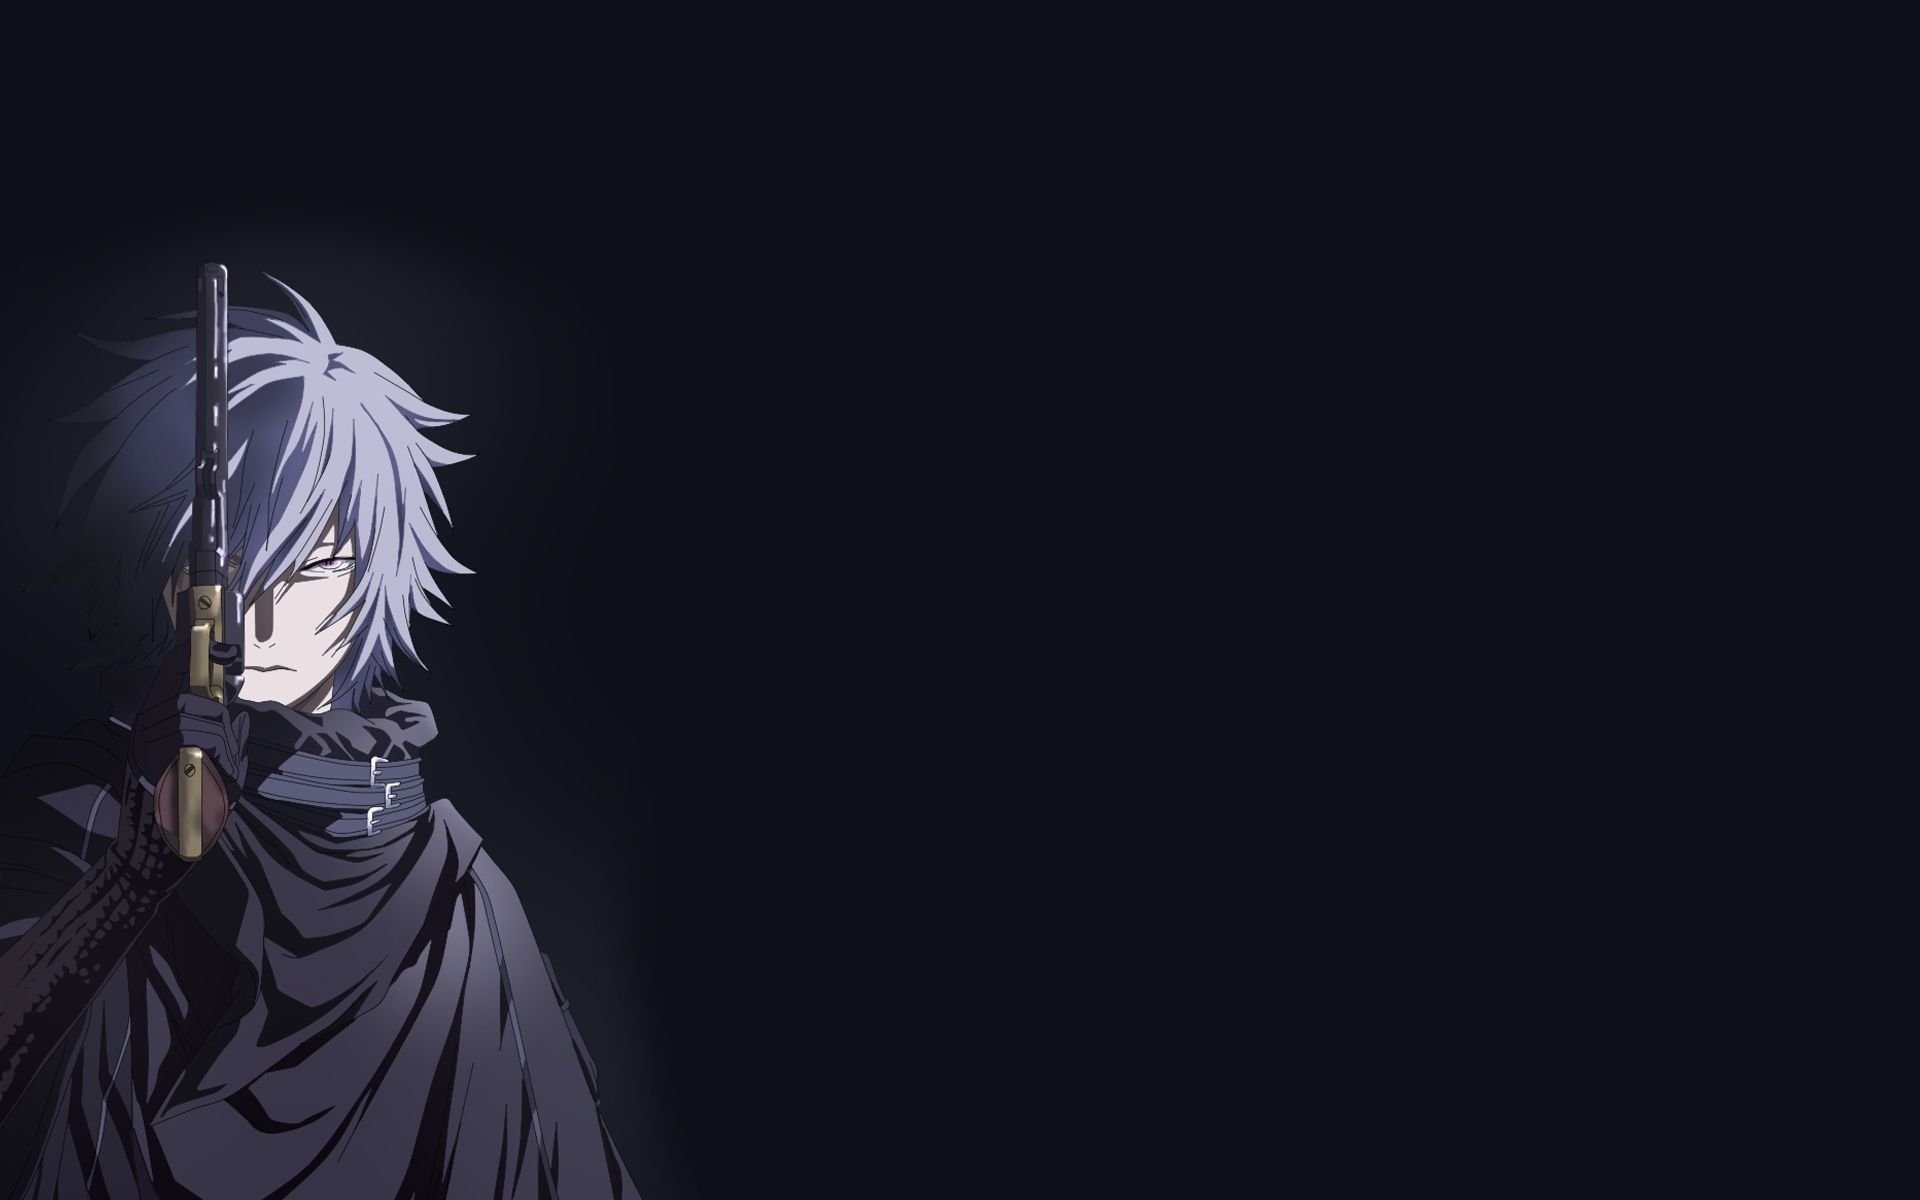 Dark Anime Wallpapers Top Free Dark Anime Backgrounds